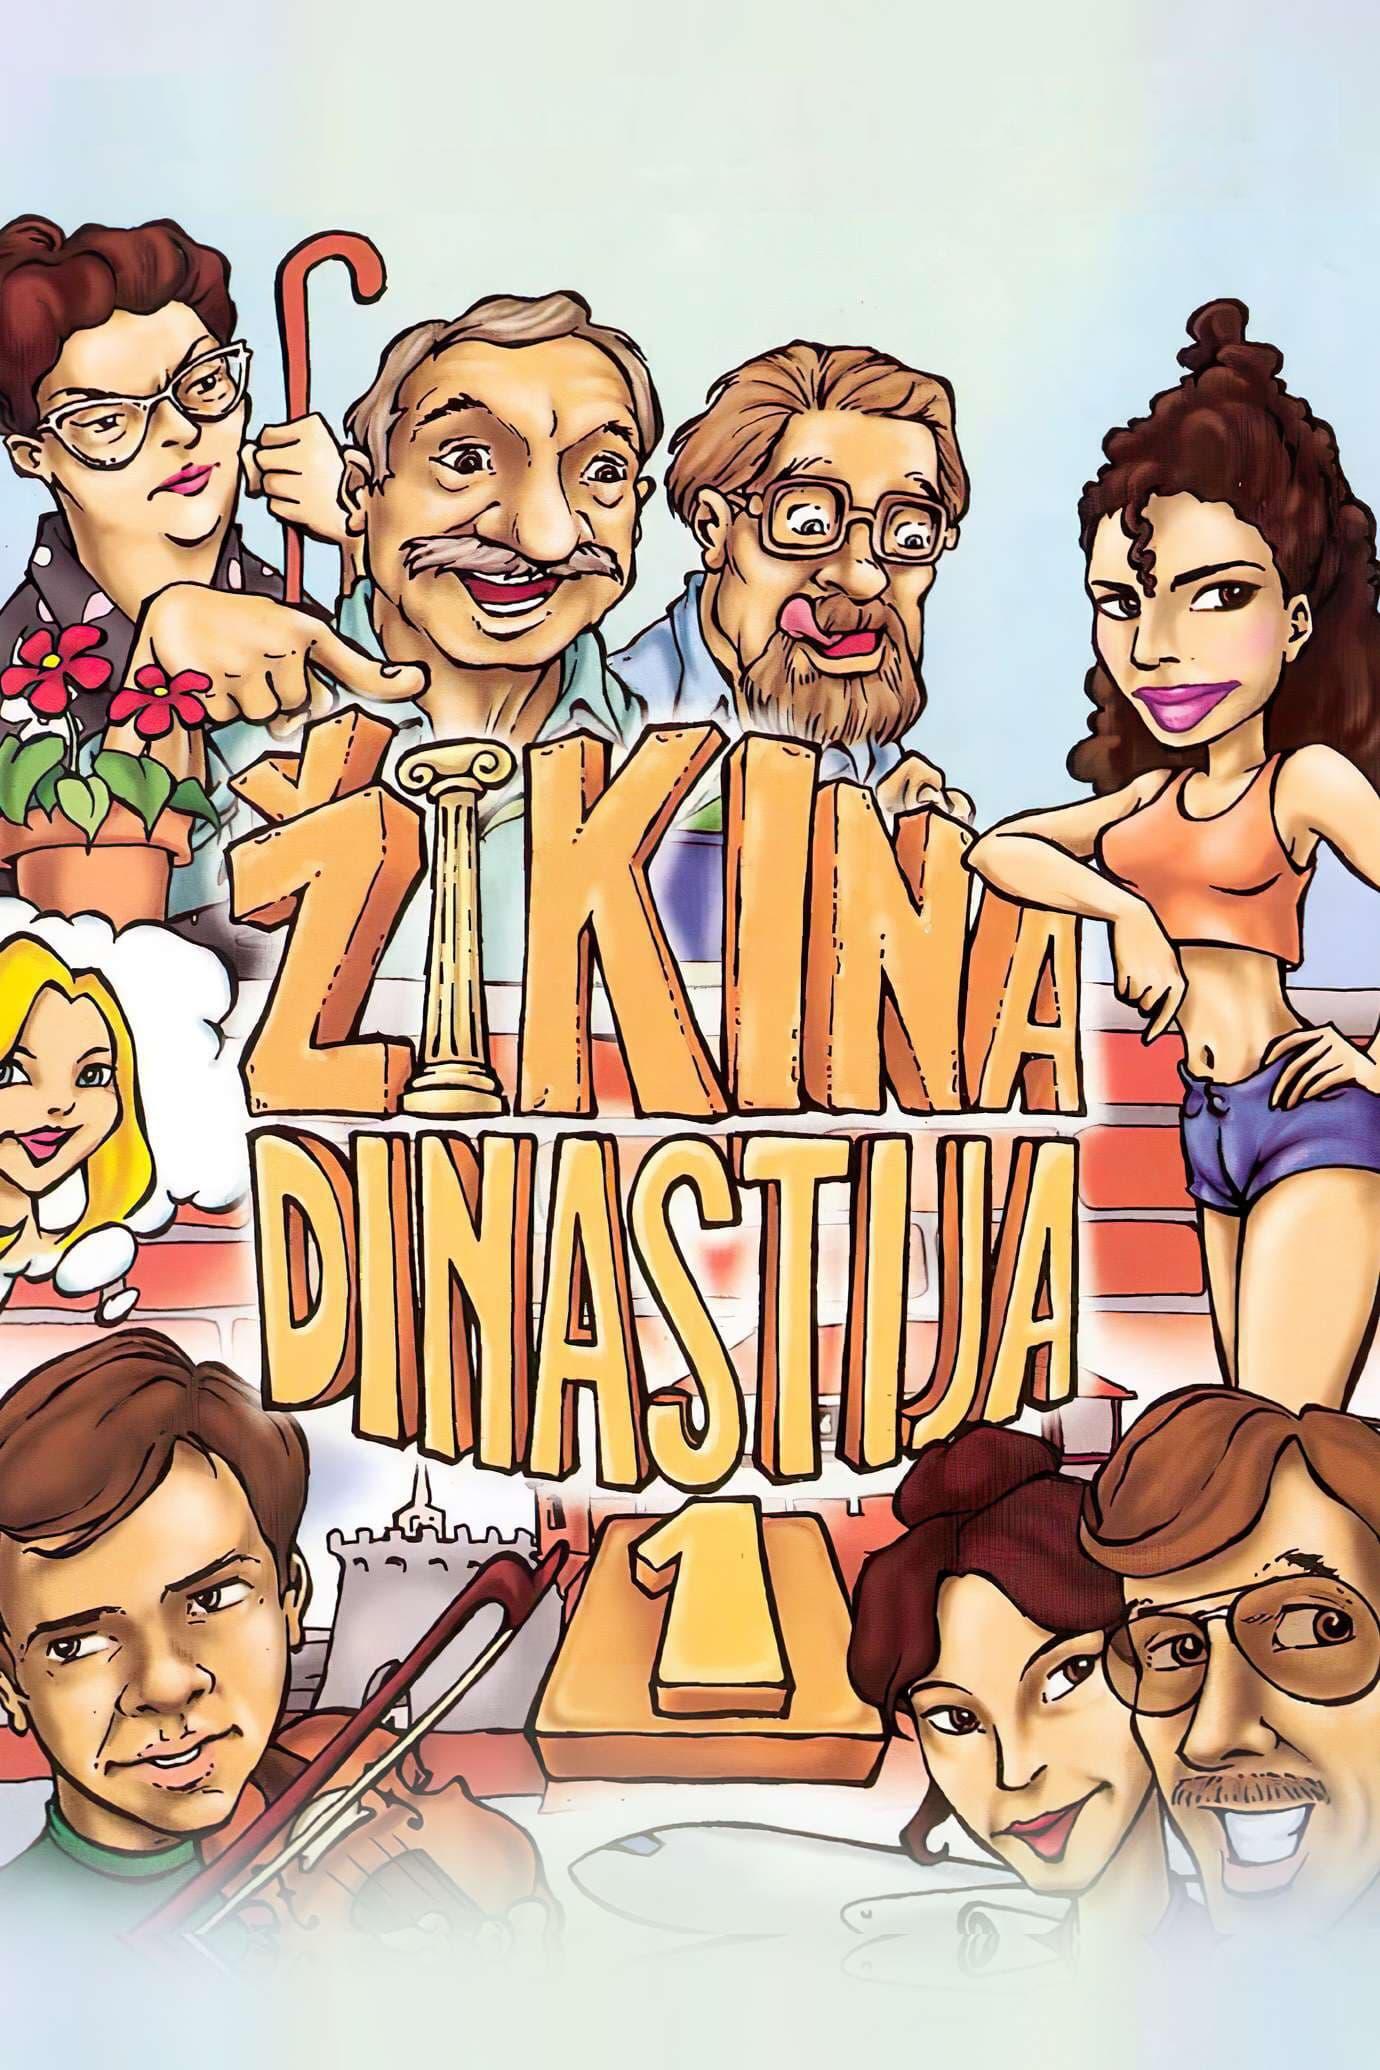 Zika's Dynasty